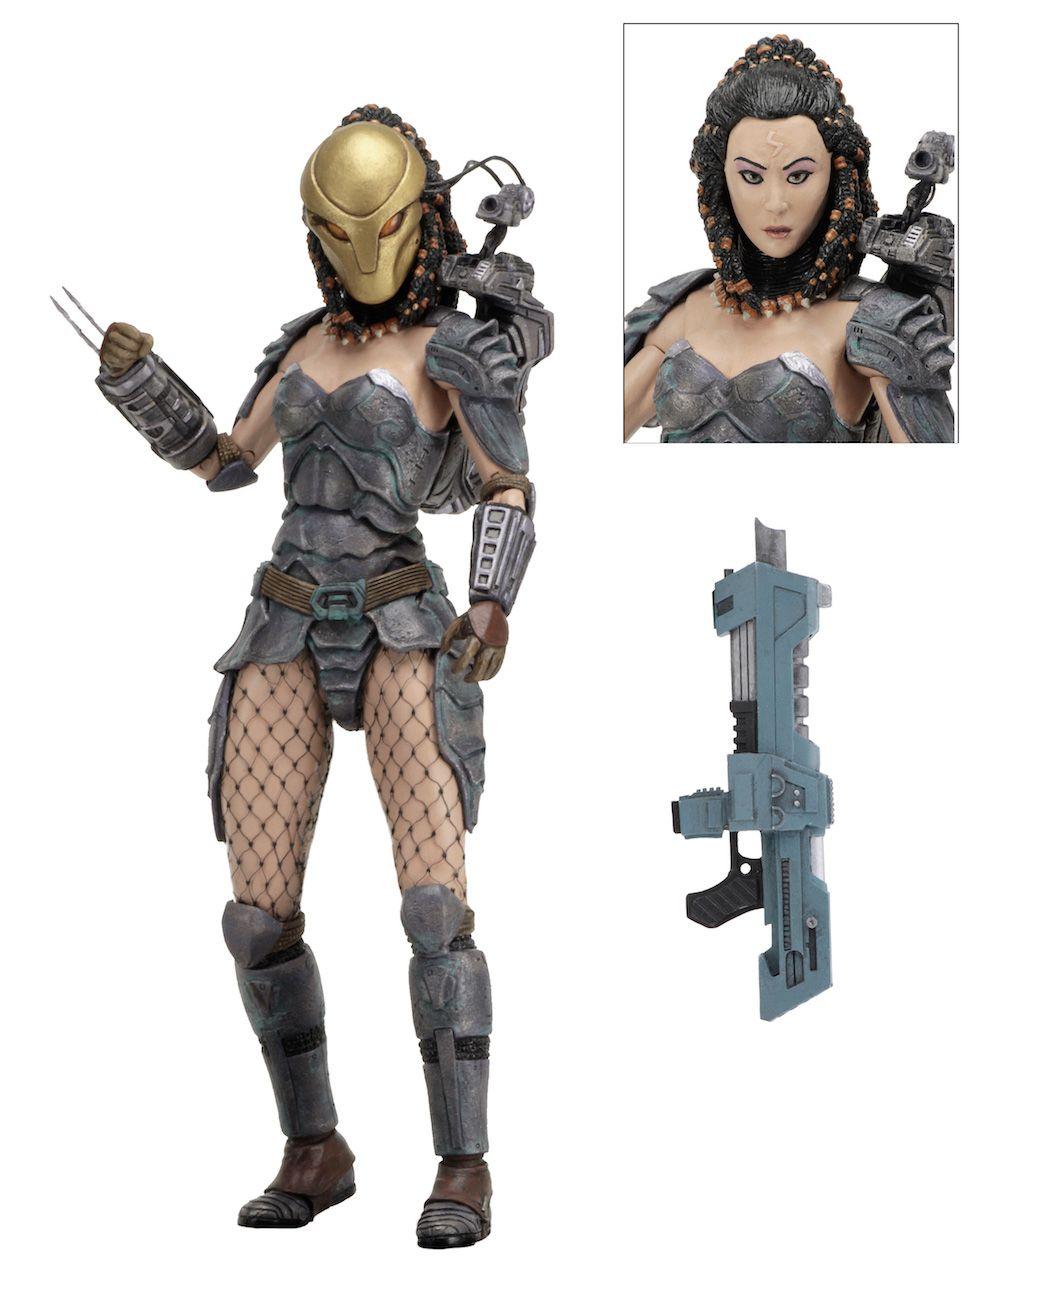 Predator-Series-17-Action-Figures-02